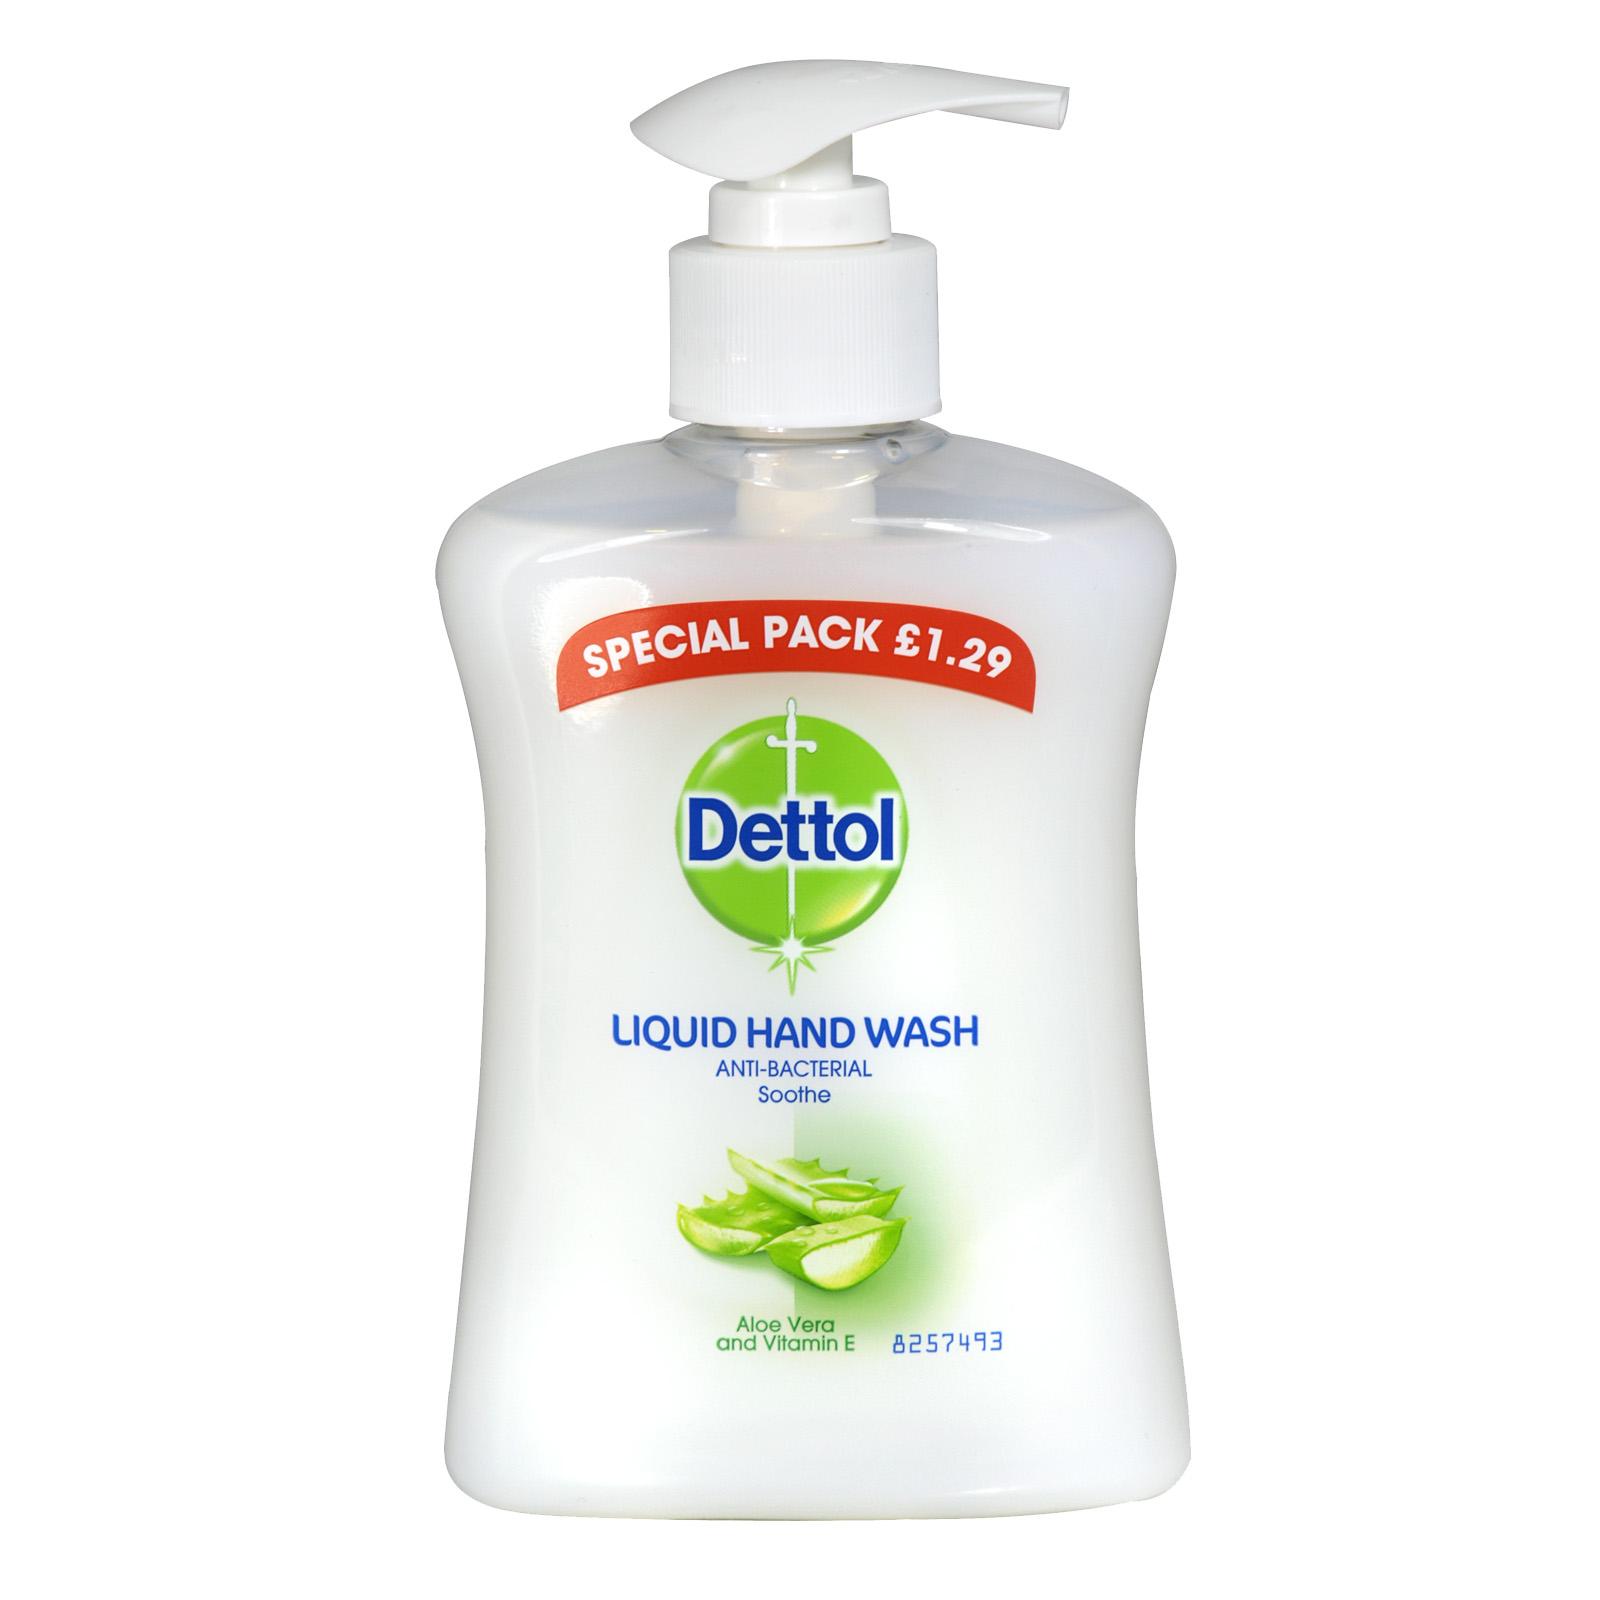 DETTOL LIQUID SOAP 250ML MOISTURE ?1.29  X6